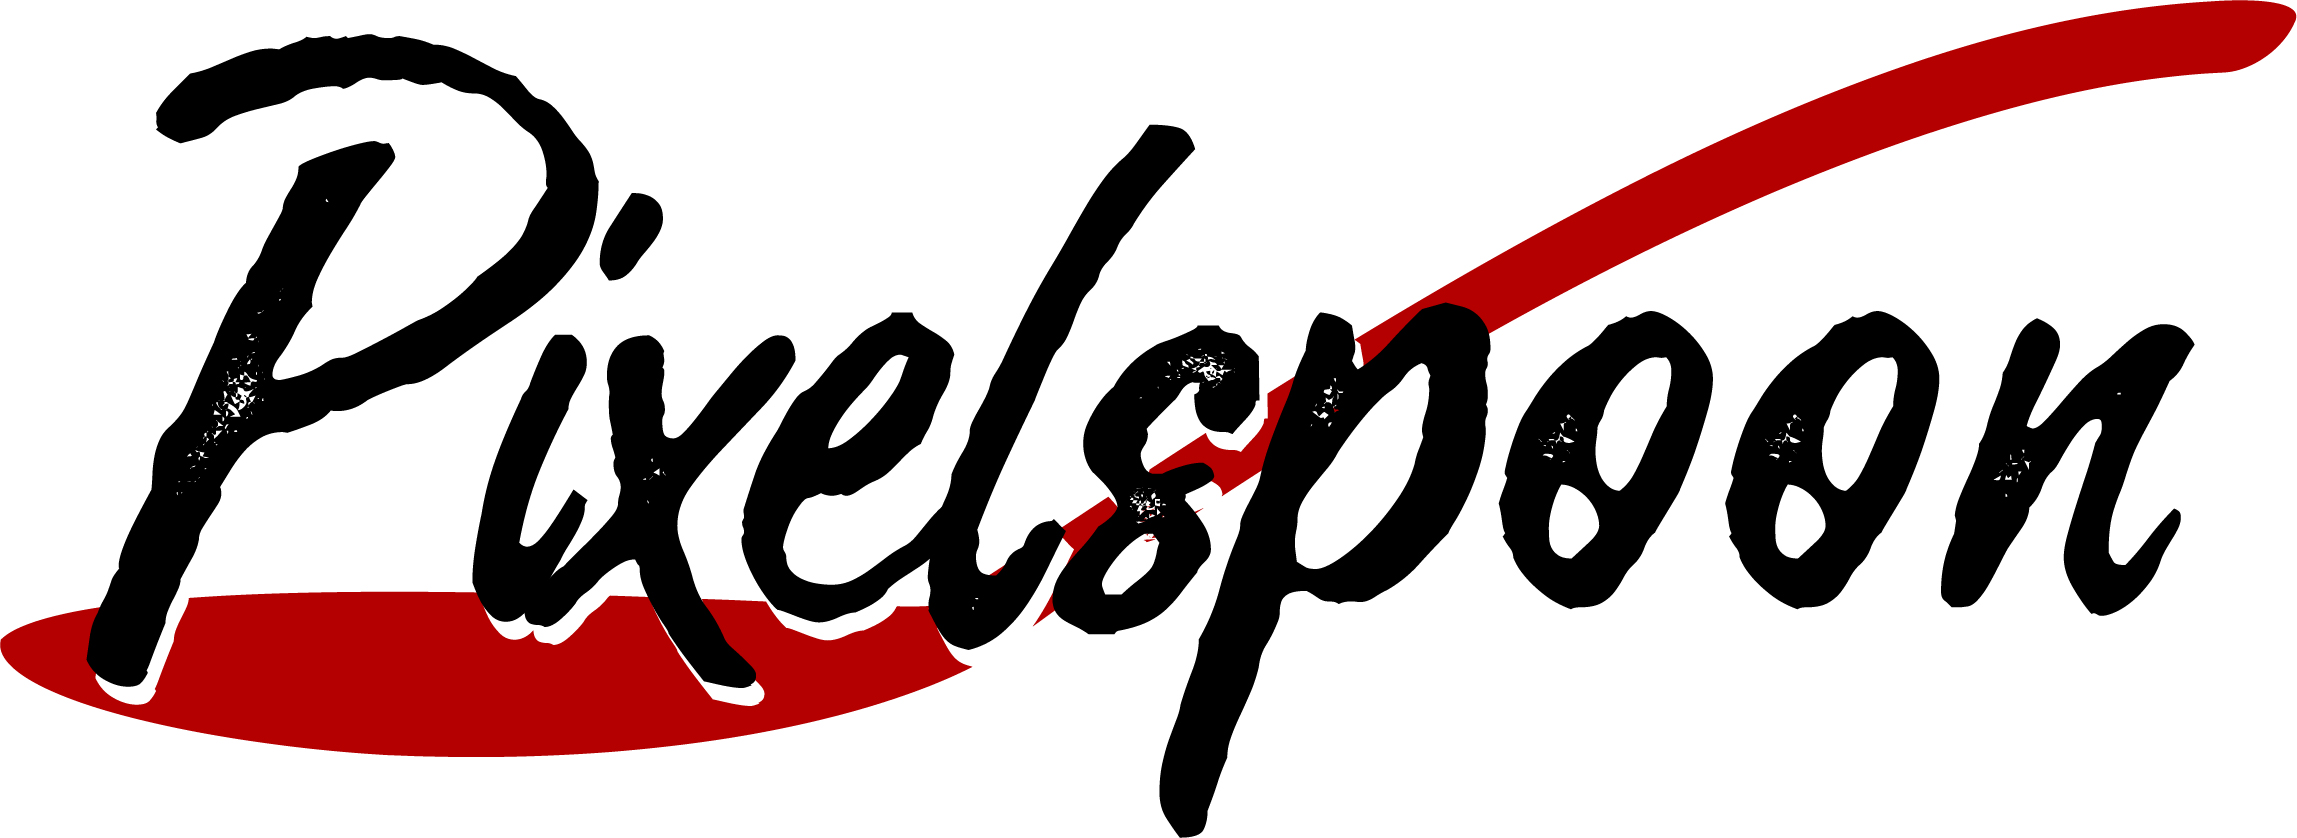 Pixelspoon | Grafikdesign